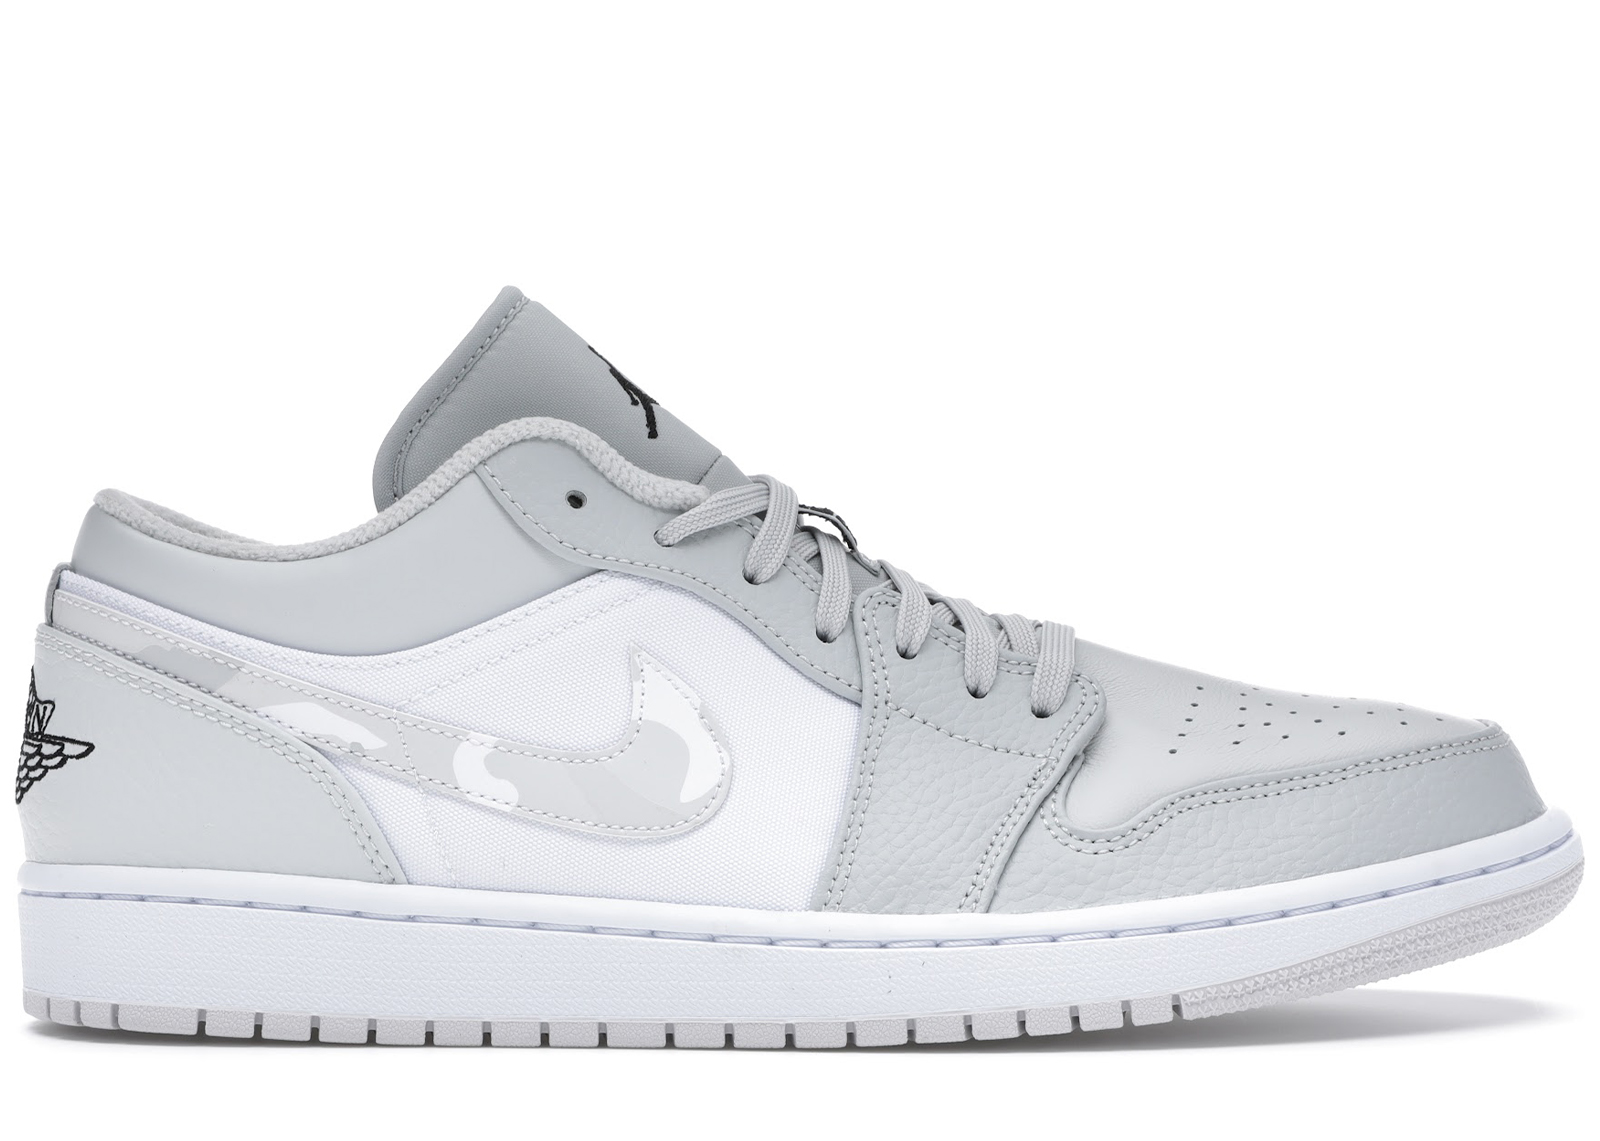 Acheter Air Jordan 1 Low Chaussures et sneakers neuves